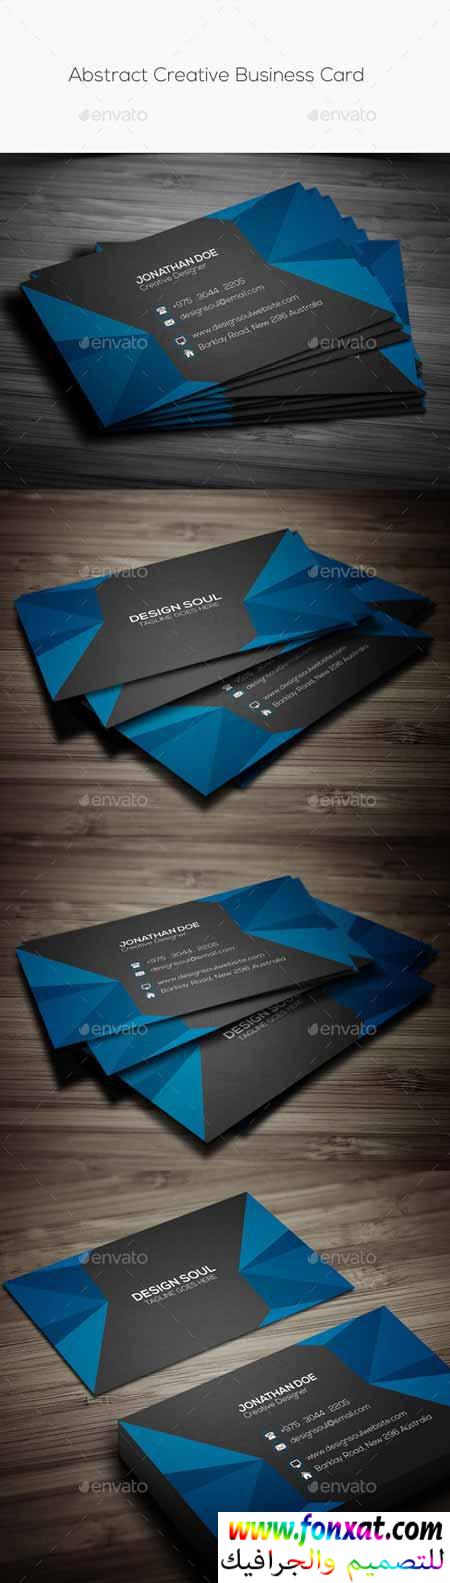 business card تصميم كارت شخصى احترافى psd رقم 20